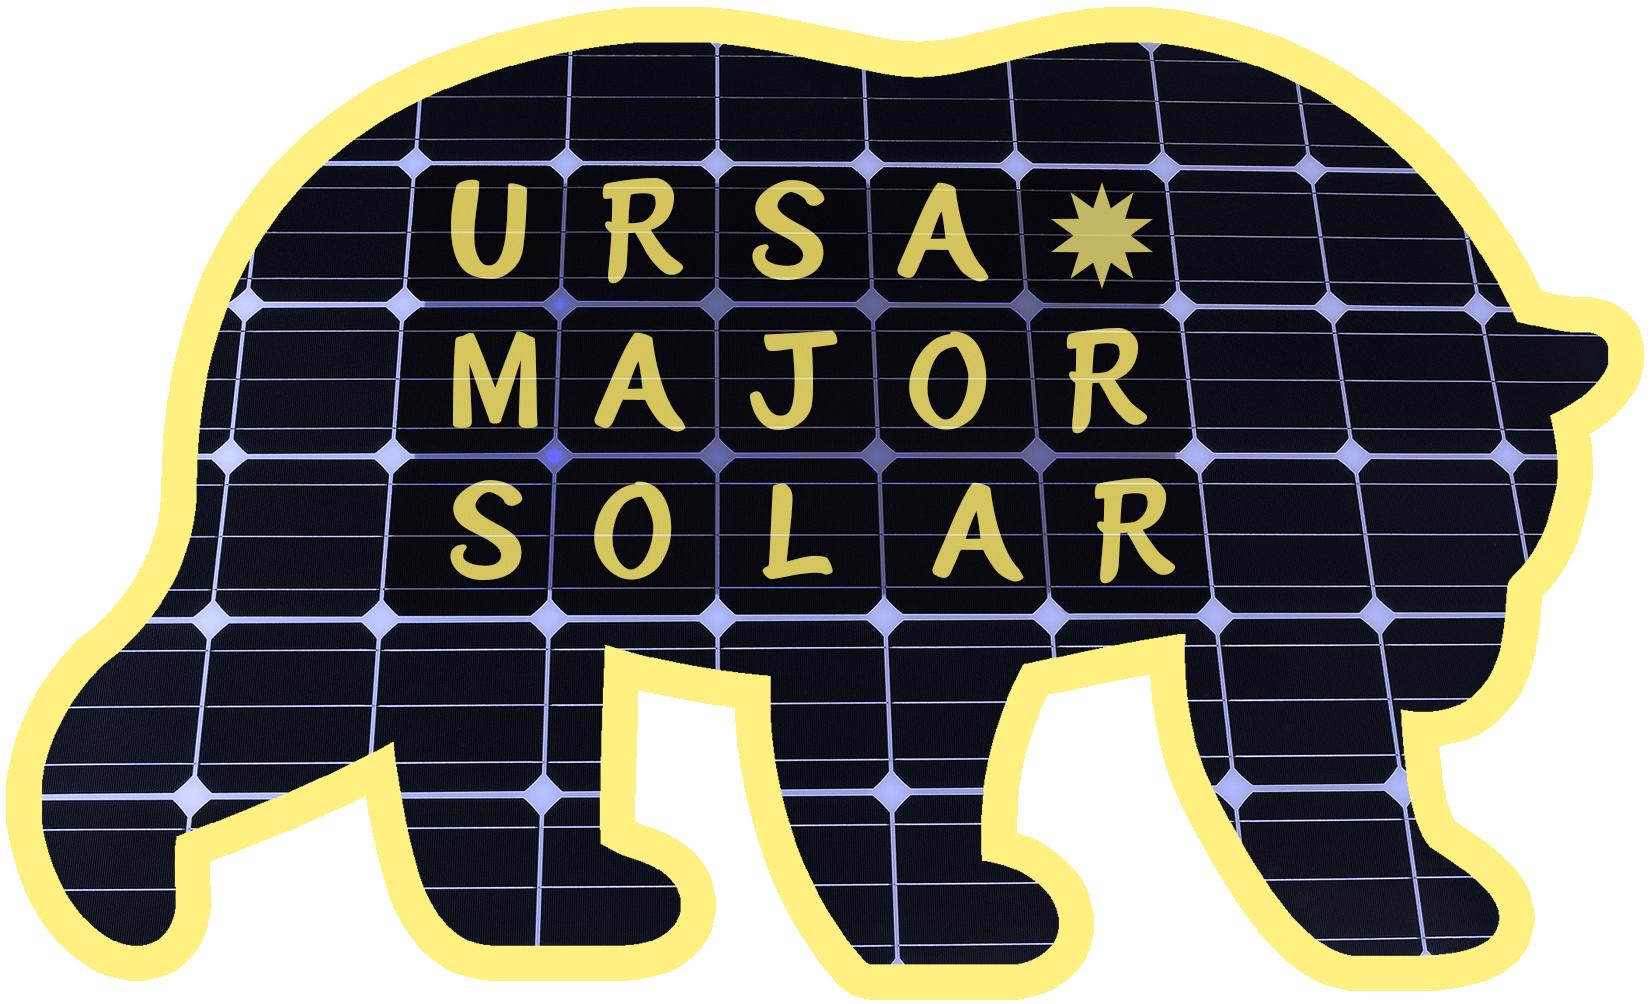 O logo da Ursa Major Solar, Inc.